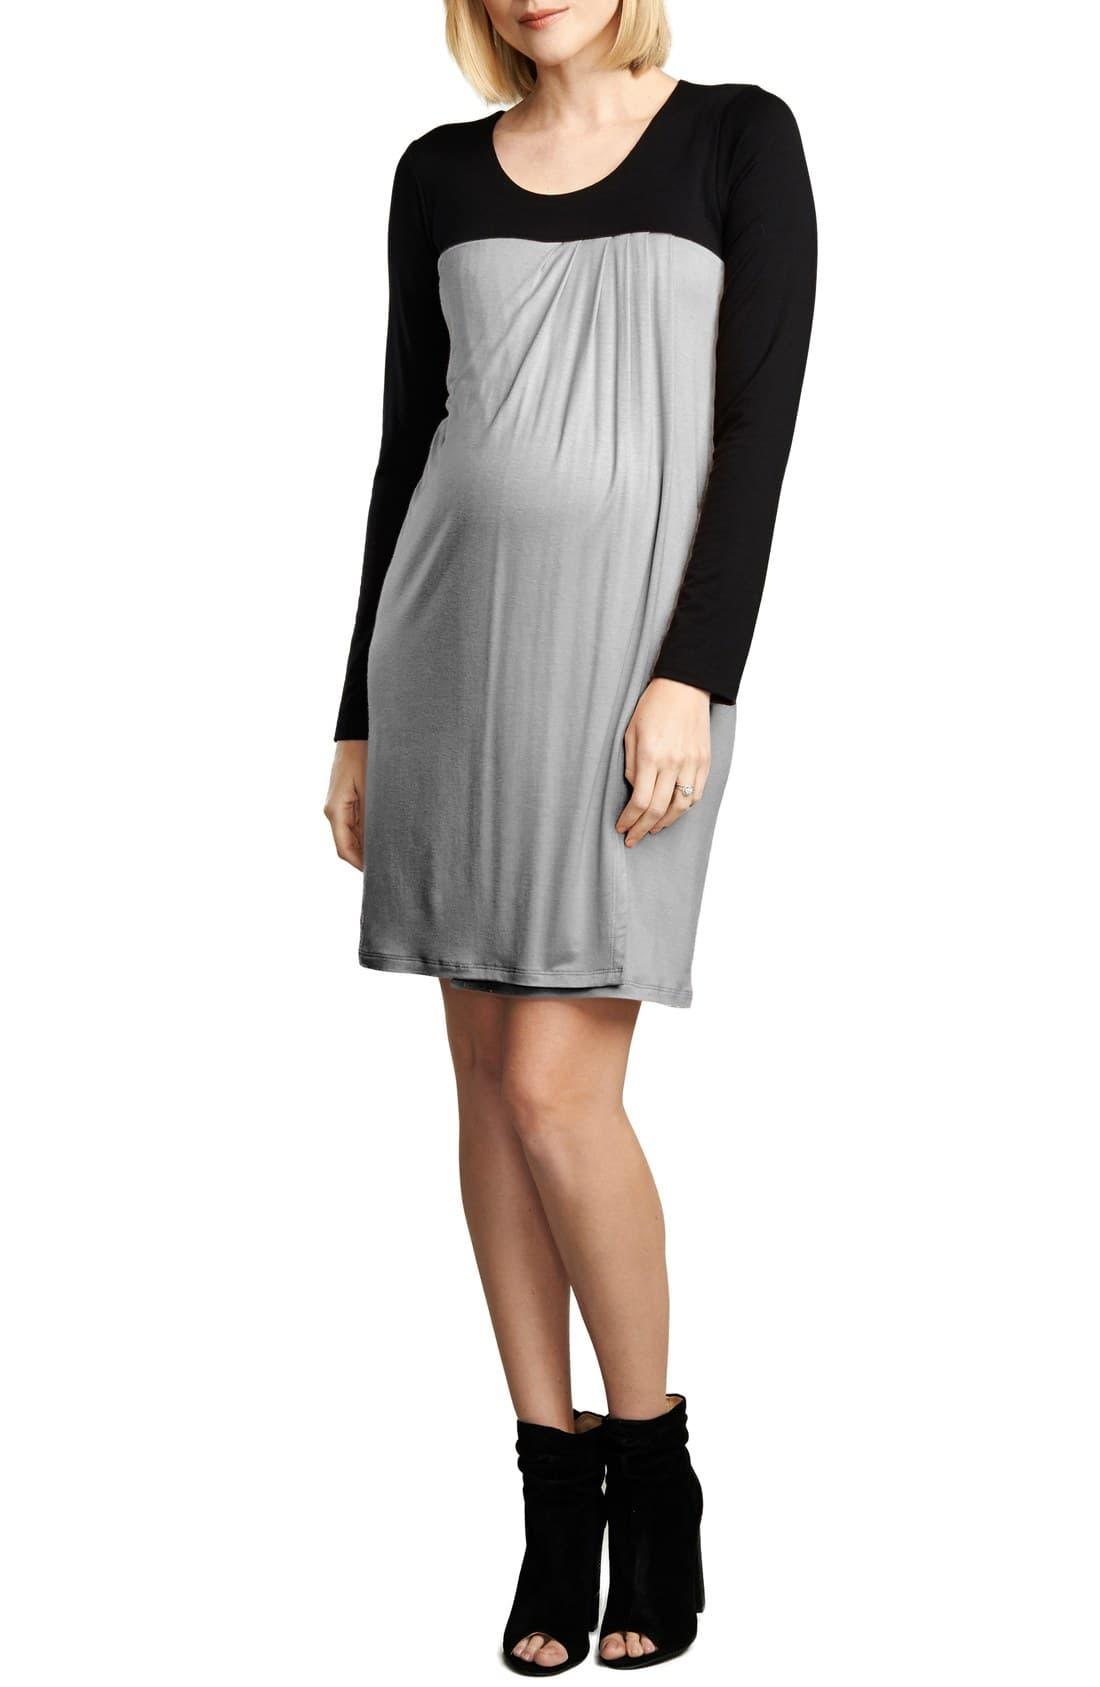 dc8f516d5266c Women's Maternal America Baby Doll Maternity/nursing Dress, Size X-Small -  Grey